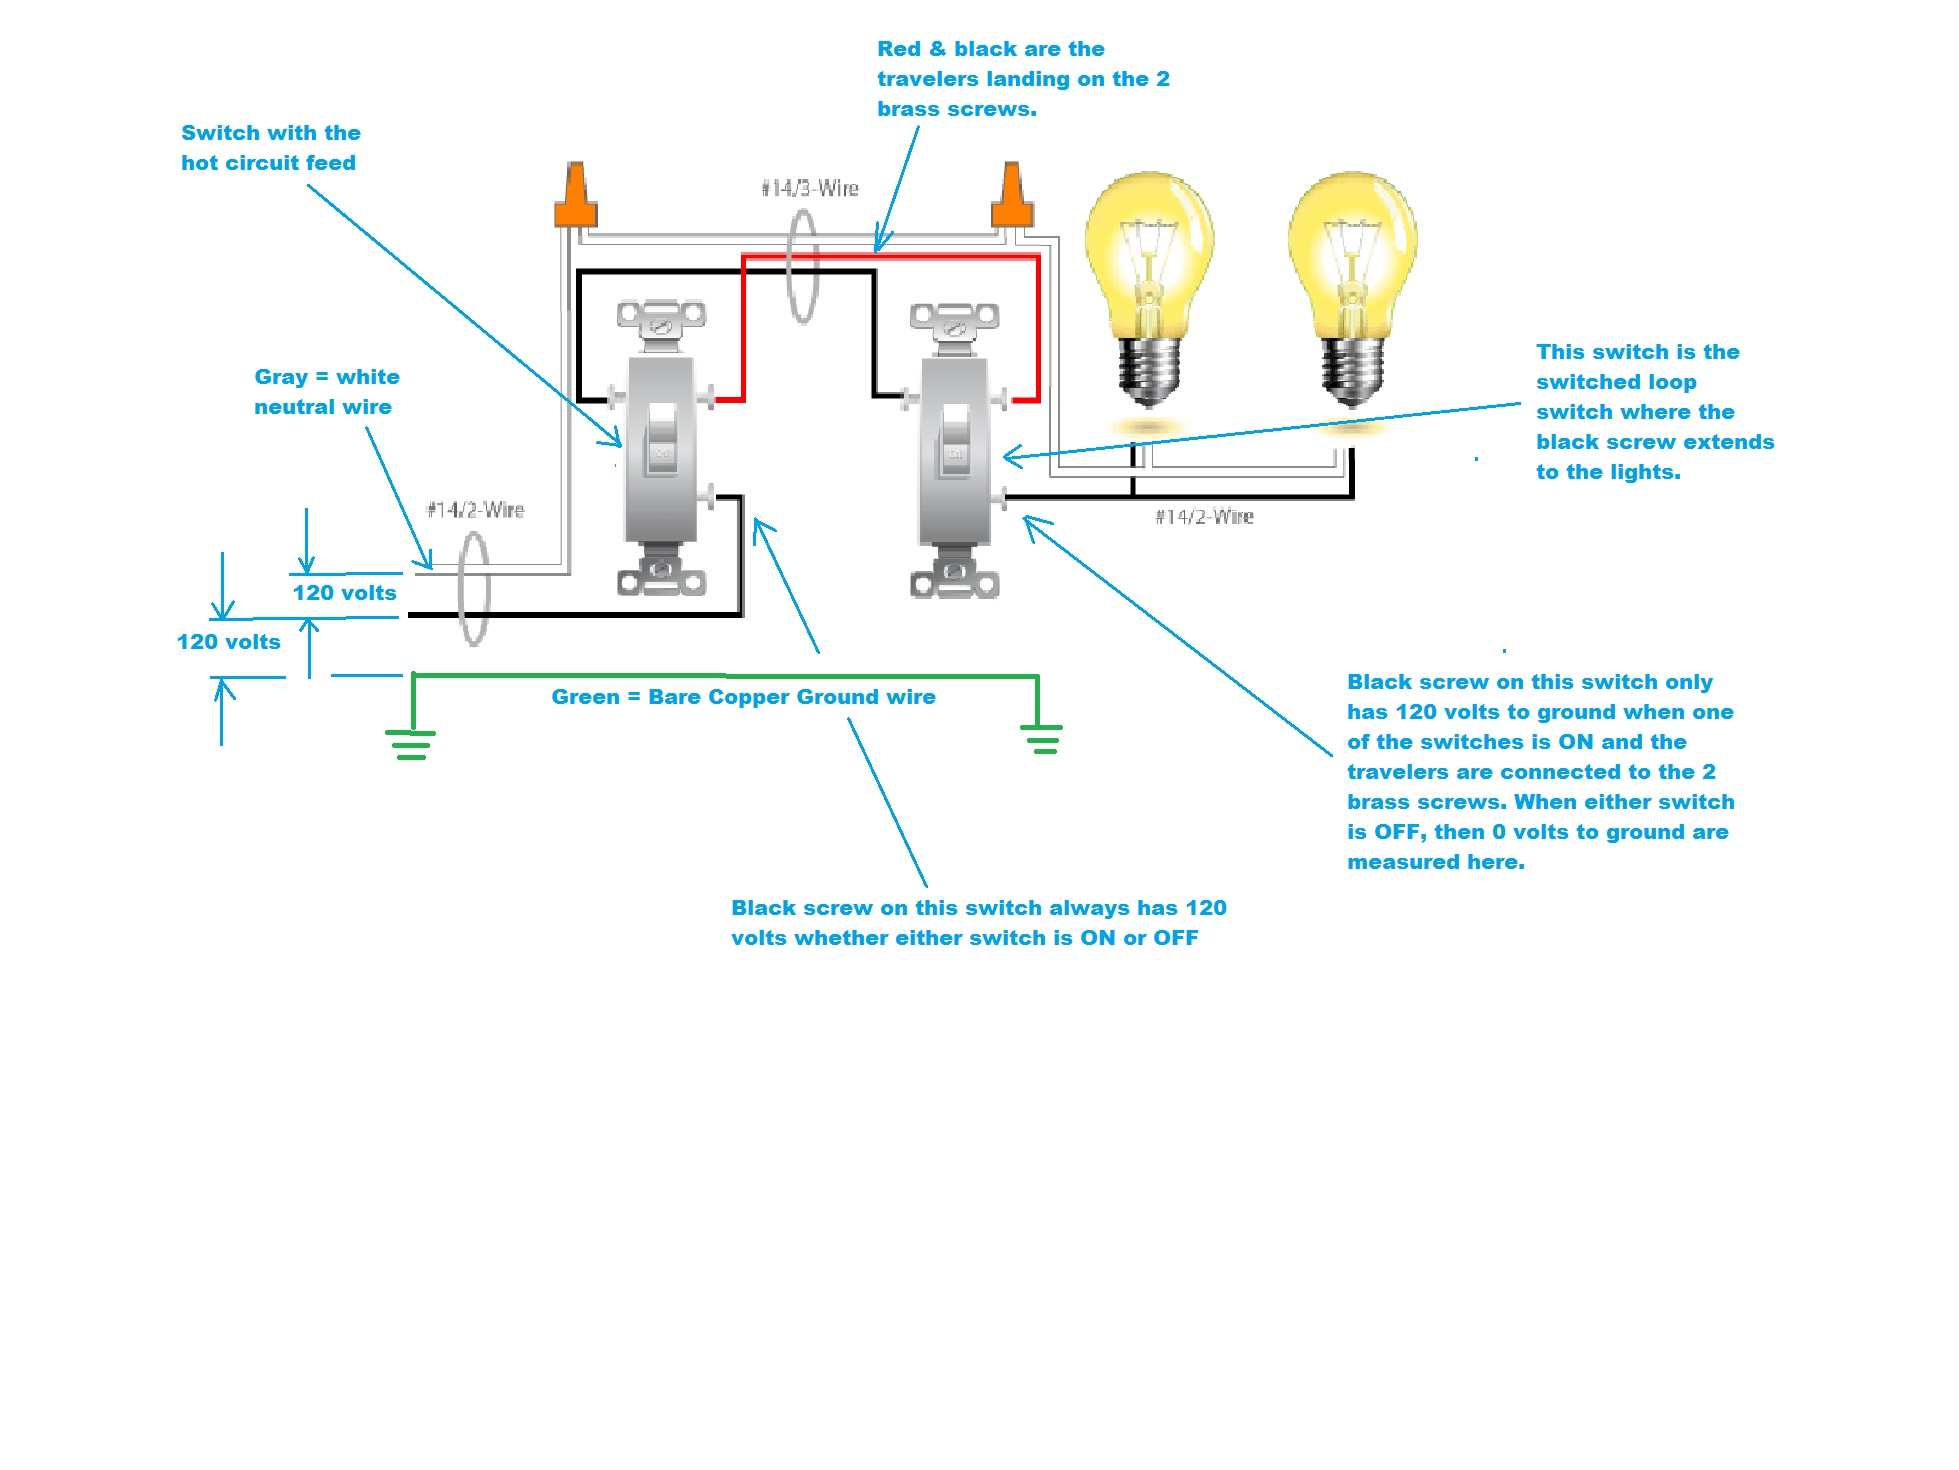 57cf4c63-0681-4684-b524-1c821bc0807d_3-way switch notes.jpg